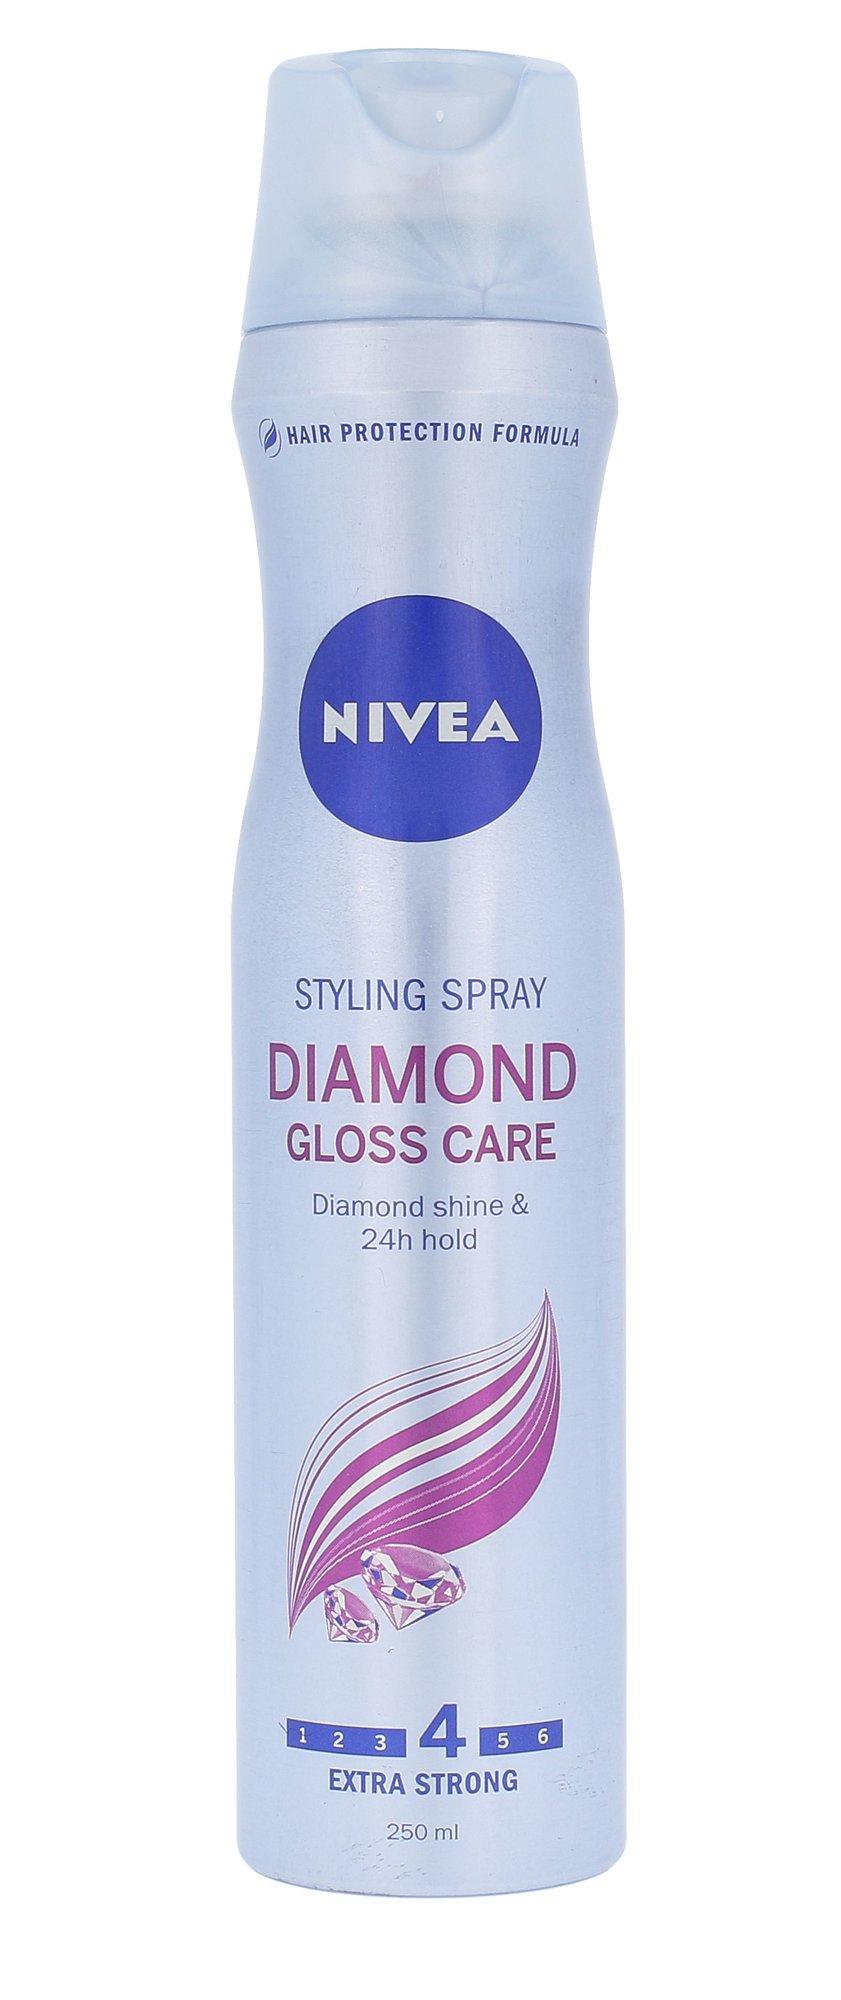 Nivea Diamond Gloss Care Cosmetic 250ml